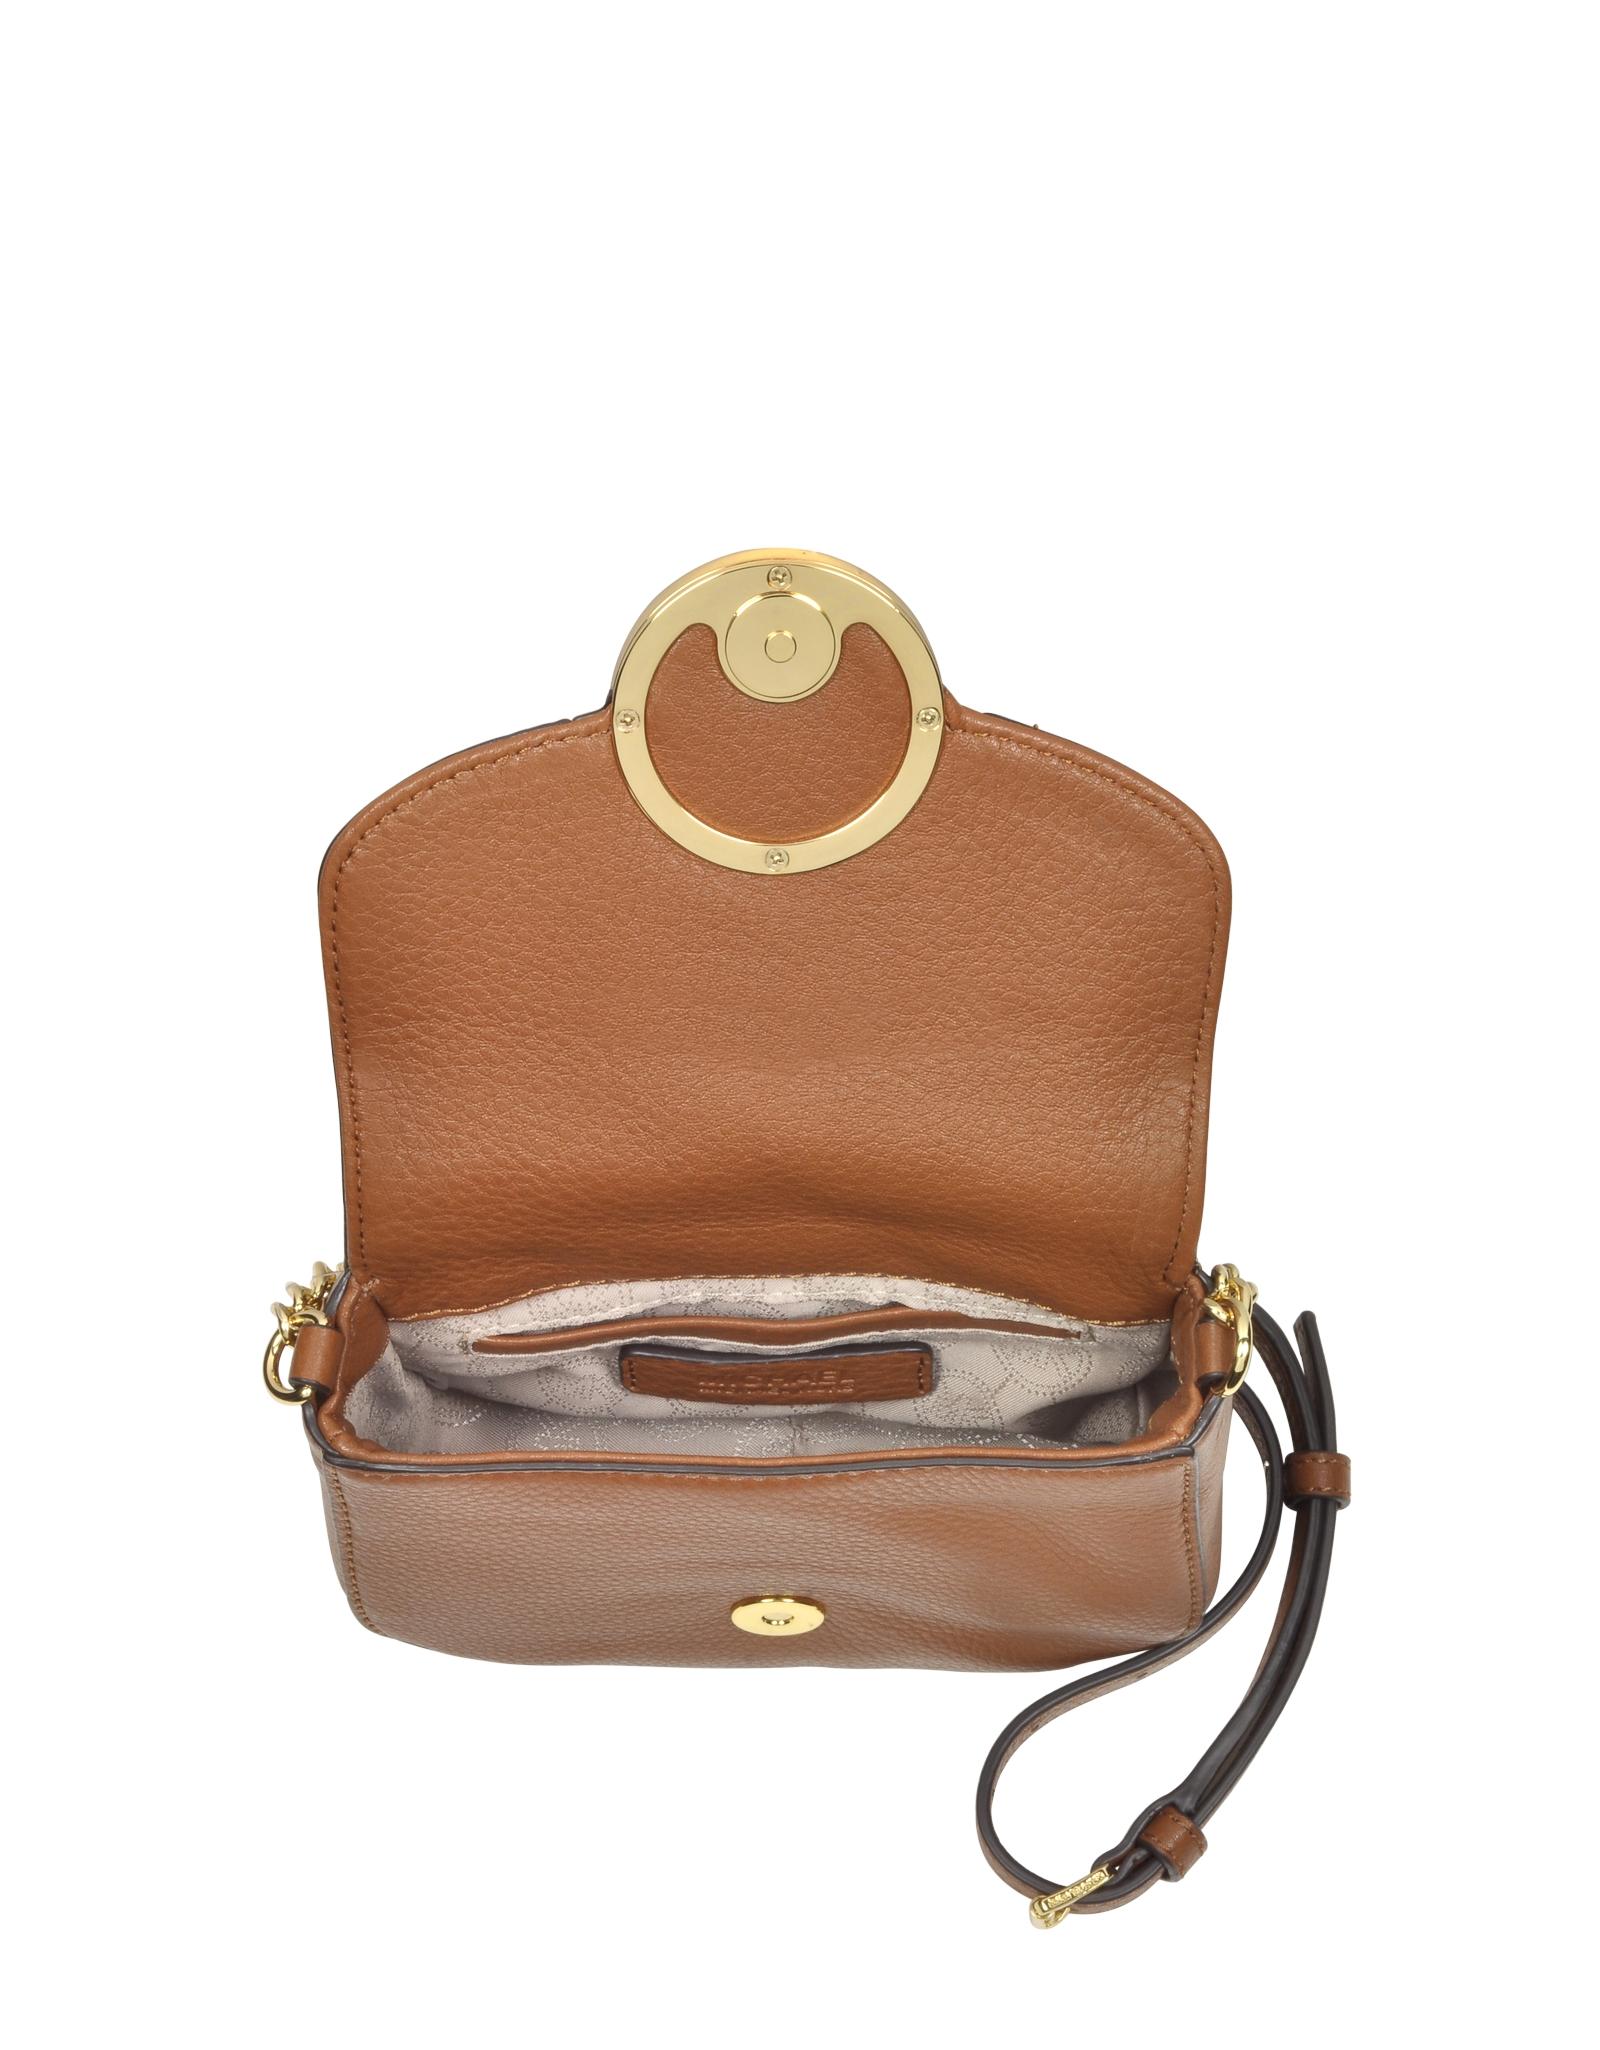 523948bf32fb57 Michael Kors Fulton Luggage Leather Small Crossbody Bag in Metallic - Lyst